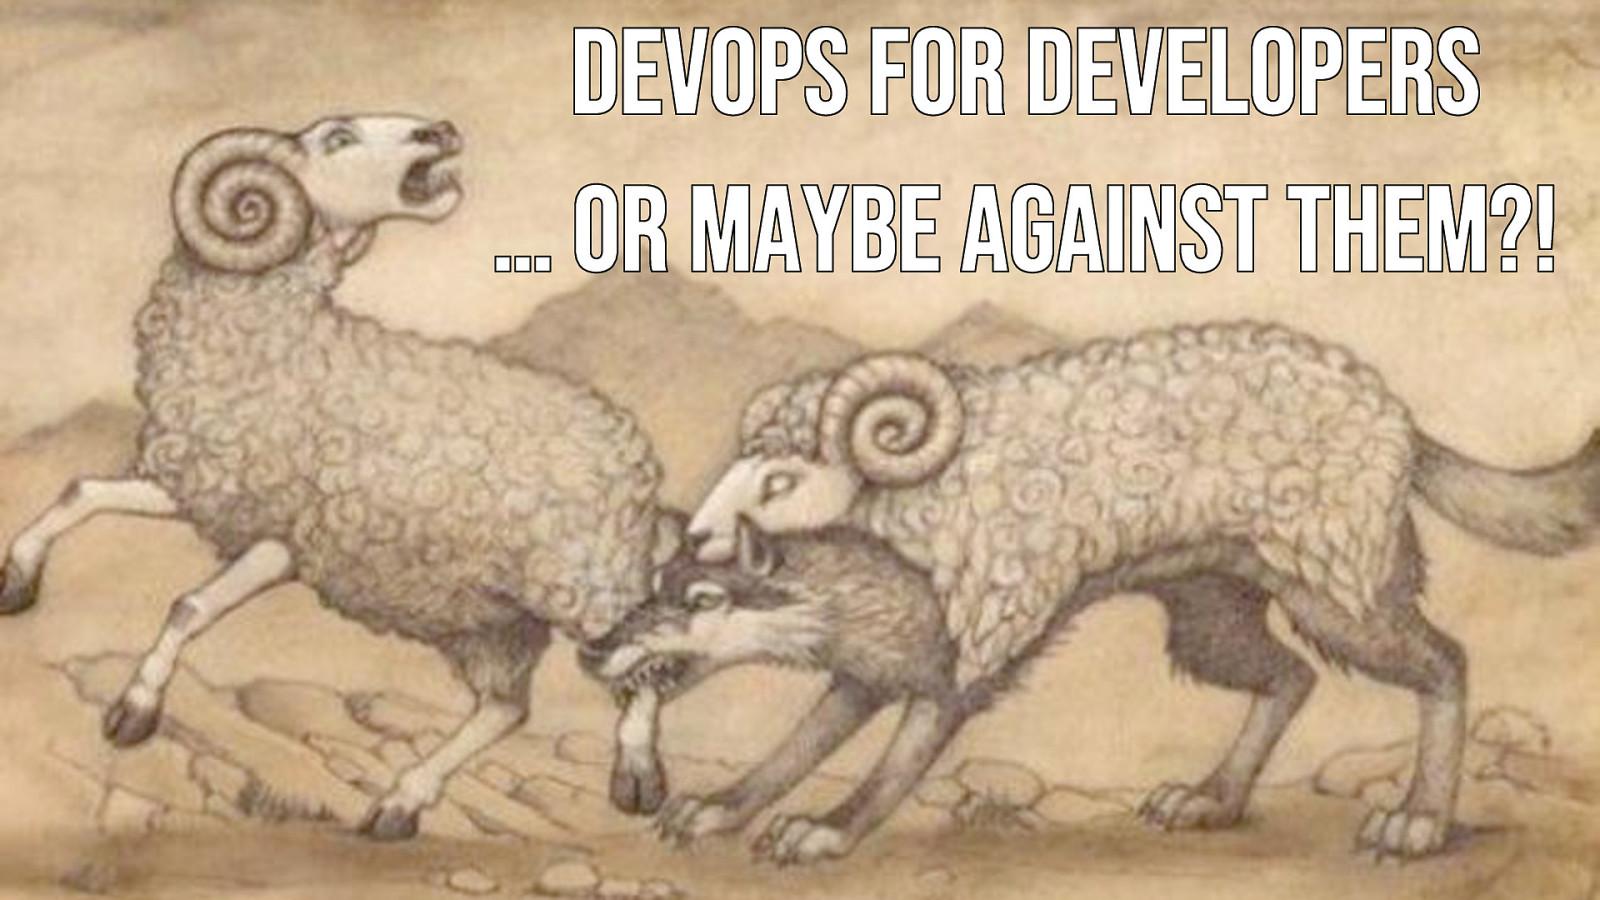 DevOps for developers (or maybe against them?!) by Baruch Sadogursky